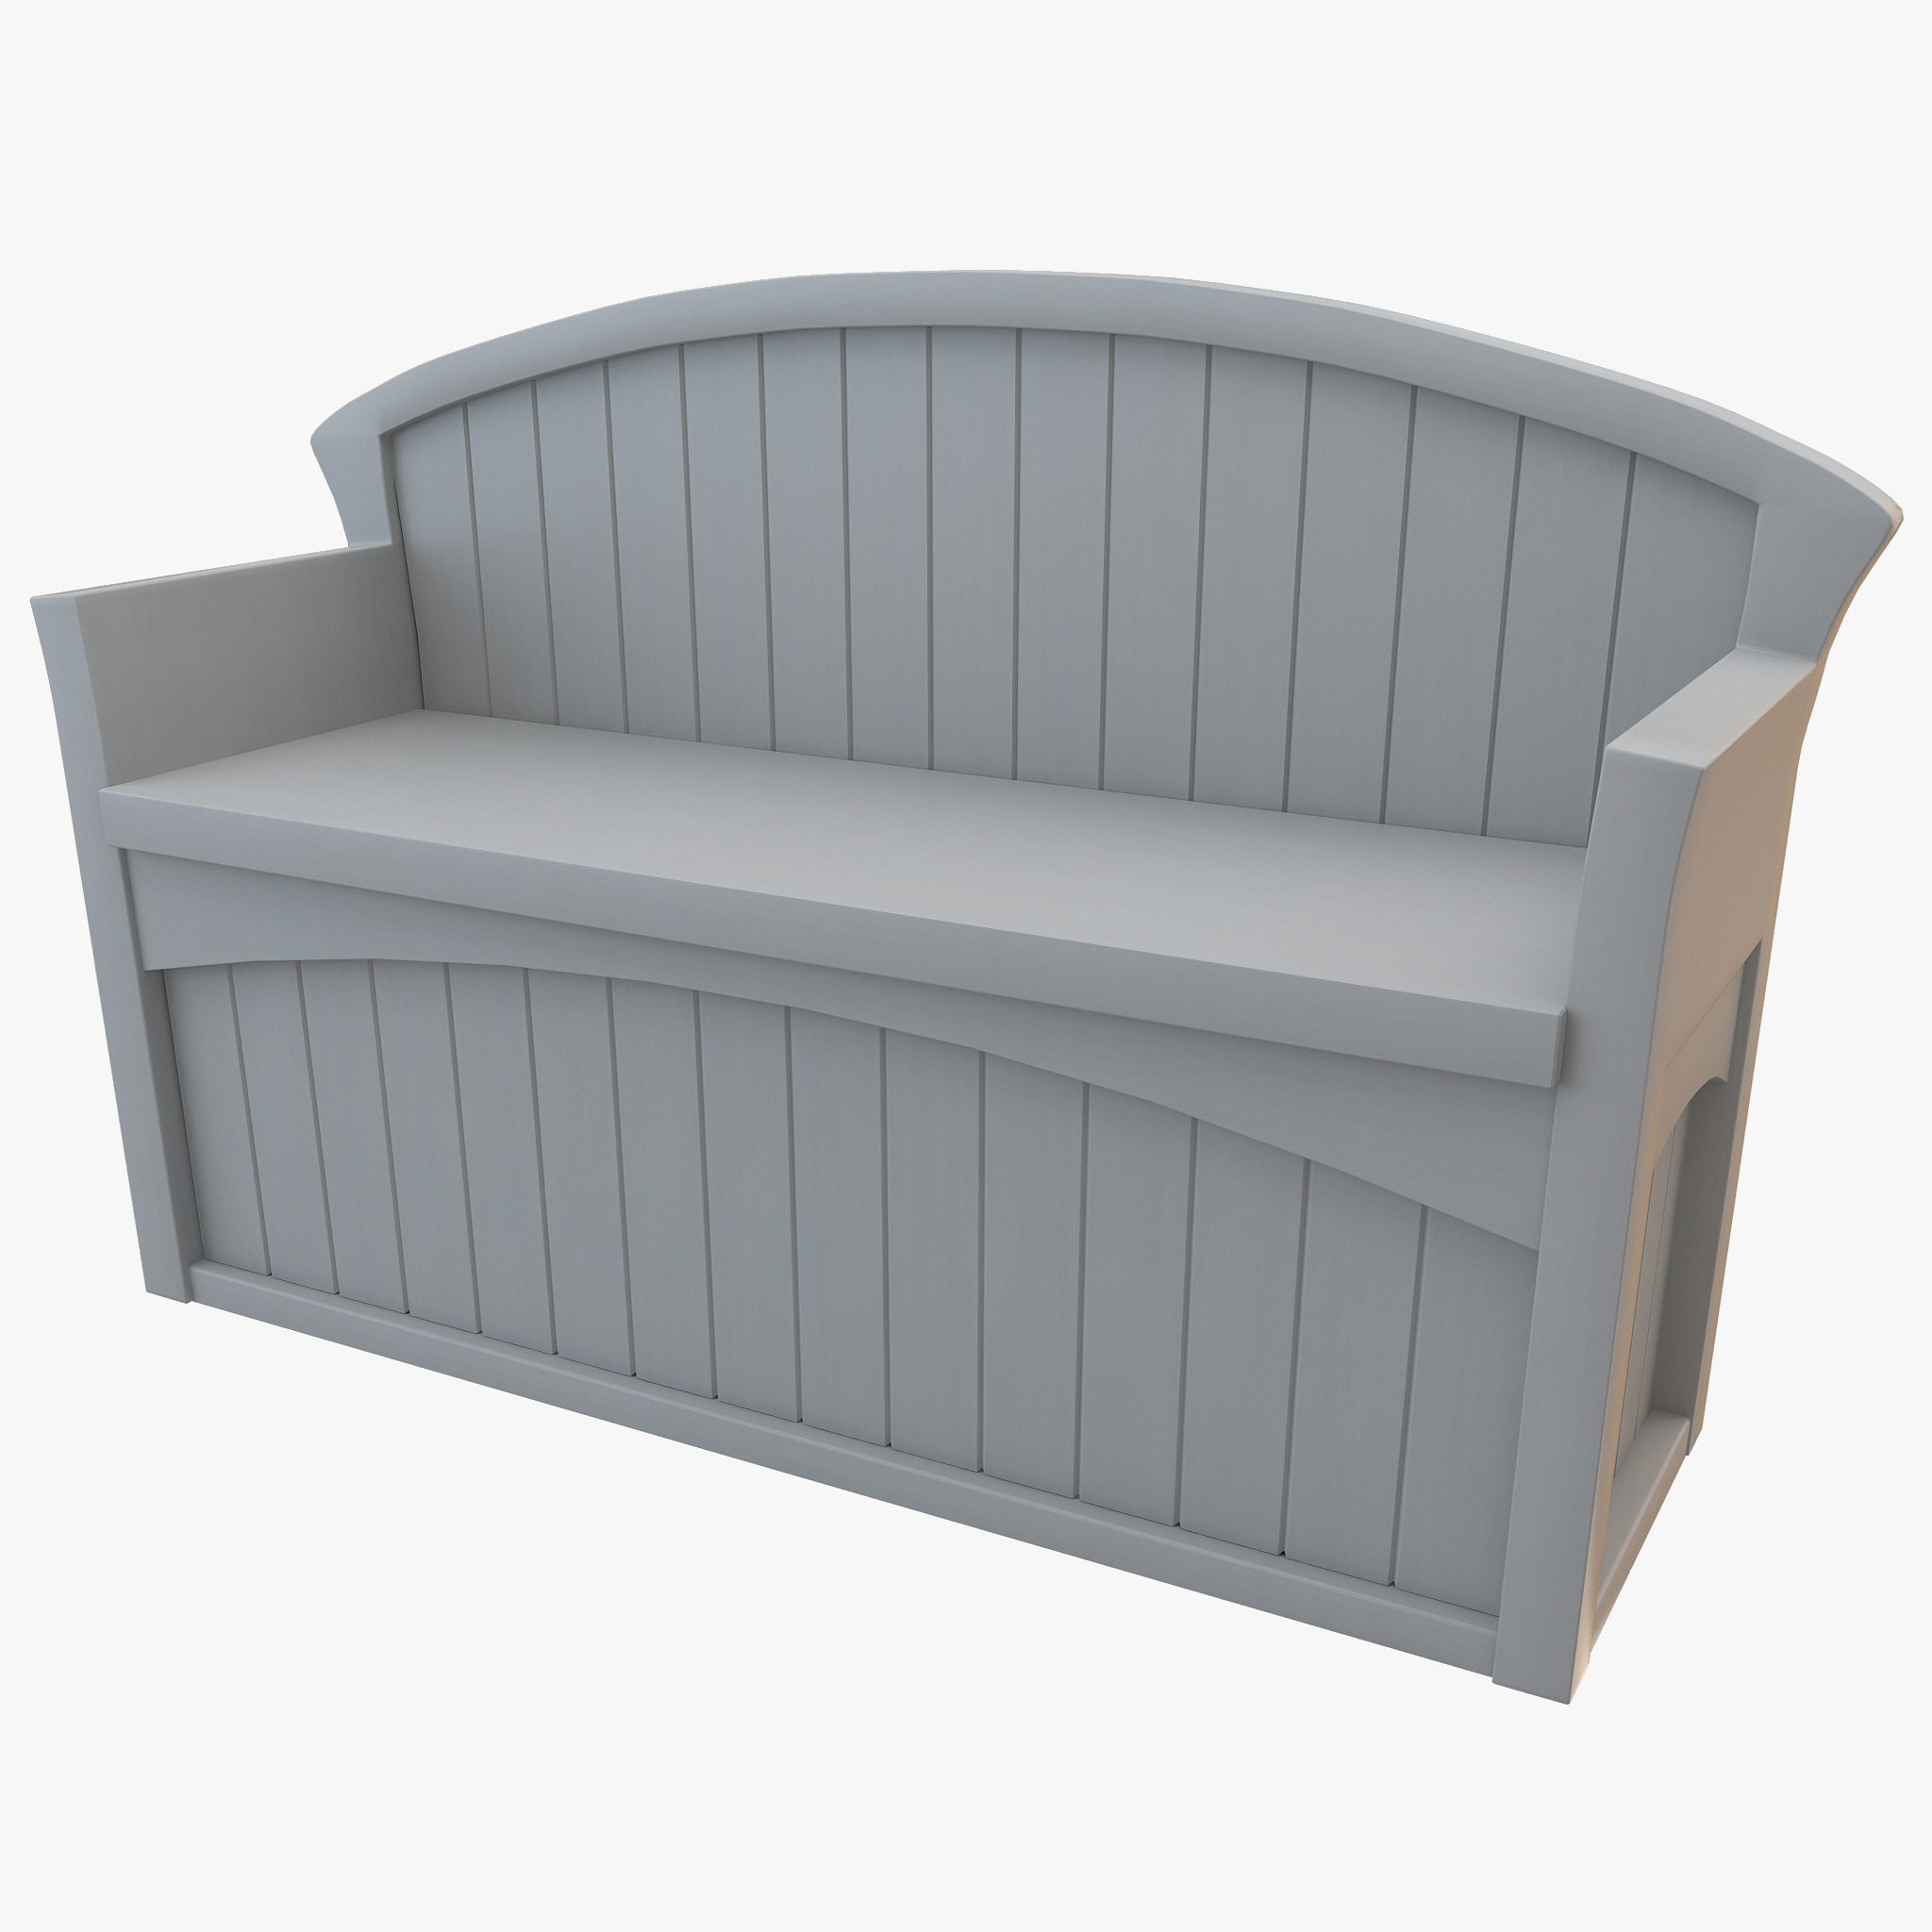 Suncast Pb6700 Patio Bench Suncast Patio Storage Bench 28 Home Goods Bench New Ridge Home Goods